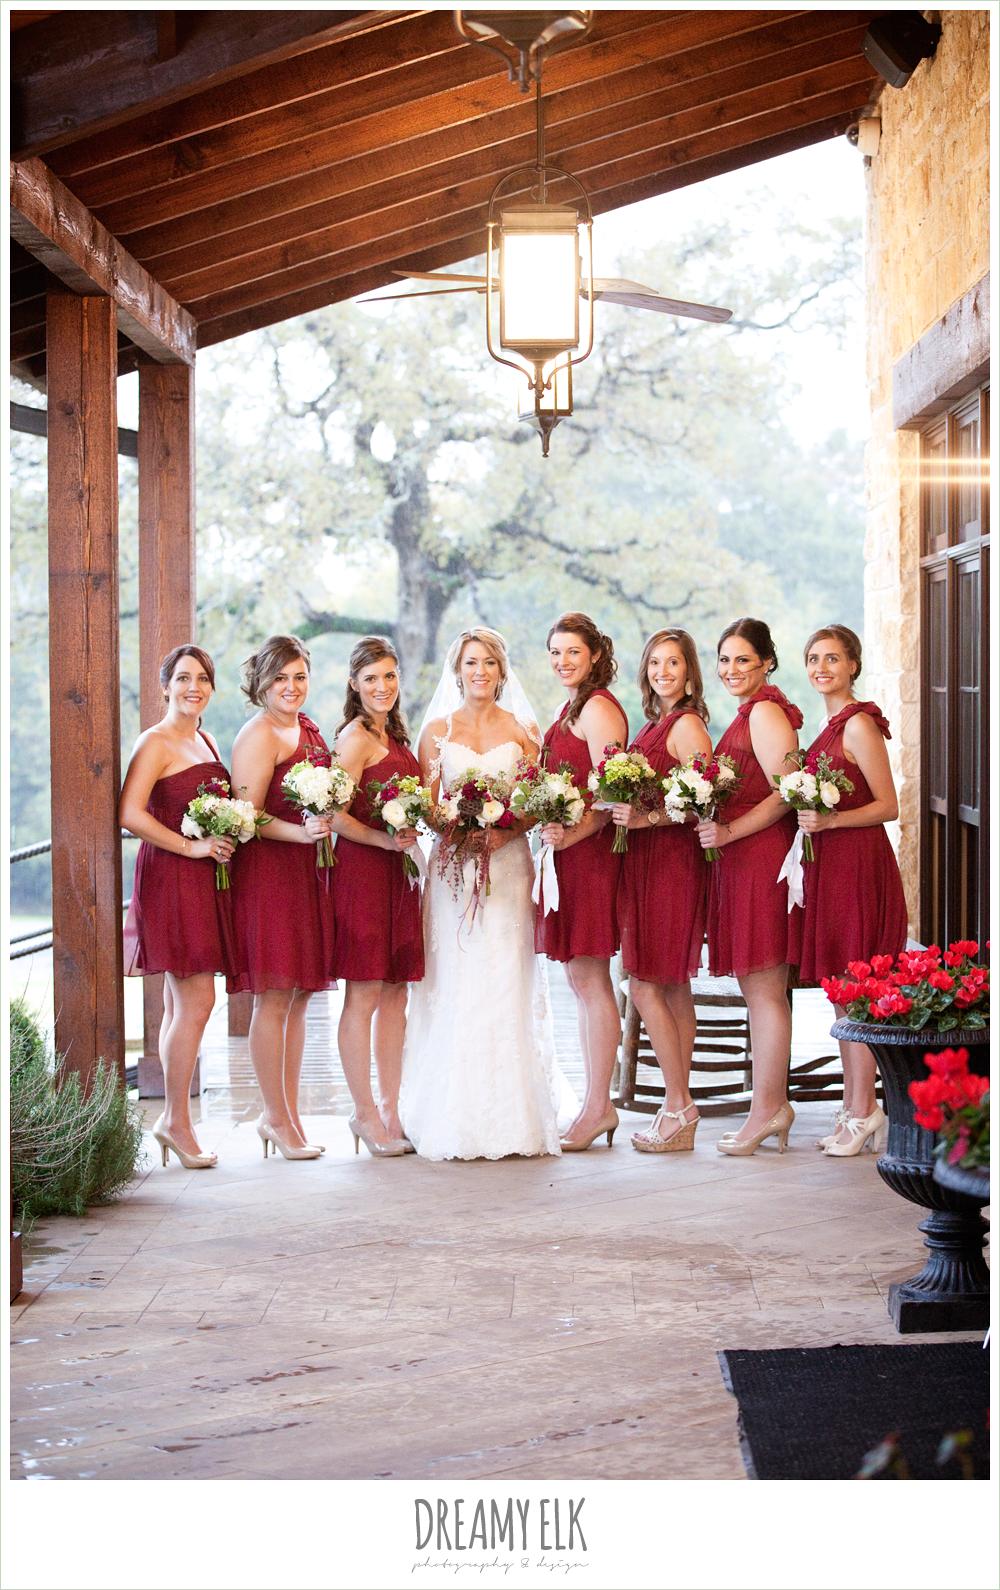 bride and bridesmaids, short cranberry bridesmaids dresses, rainy fall wedding, rock lake ranch, dreamy elk photography and design